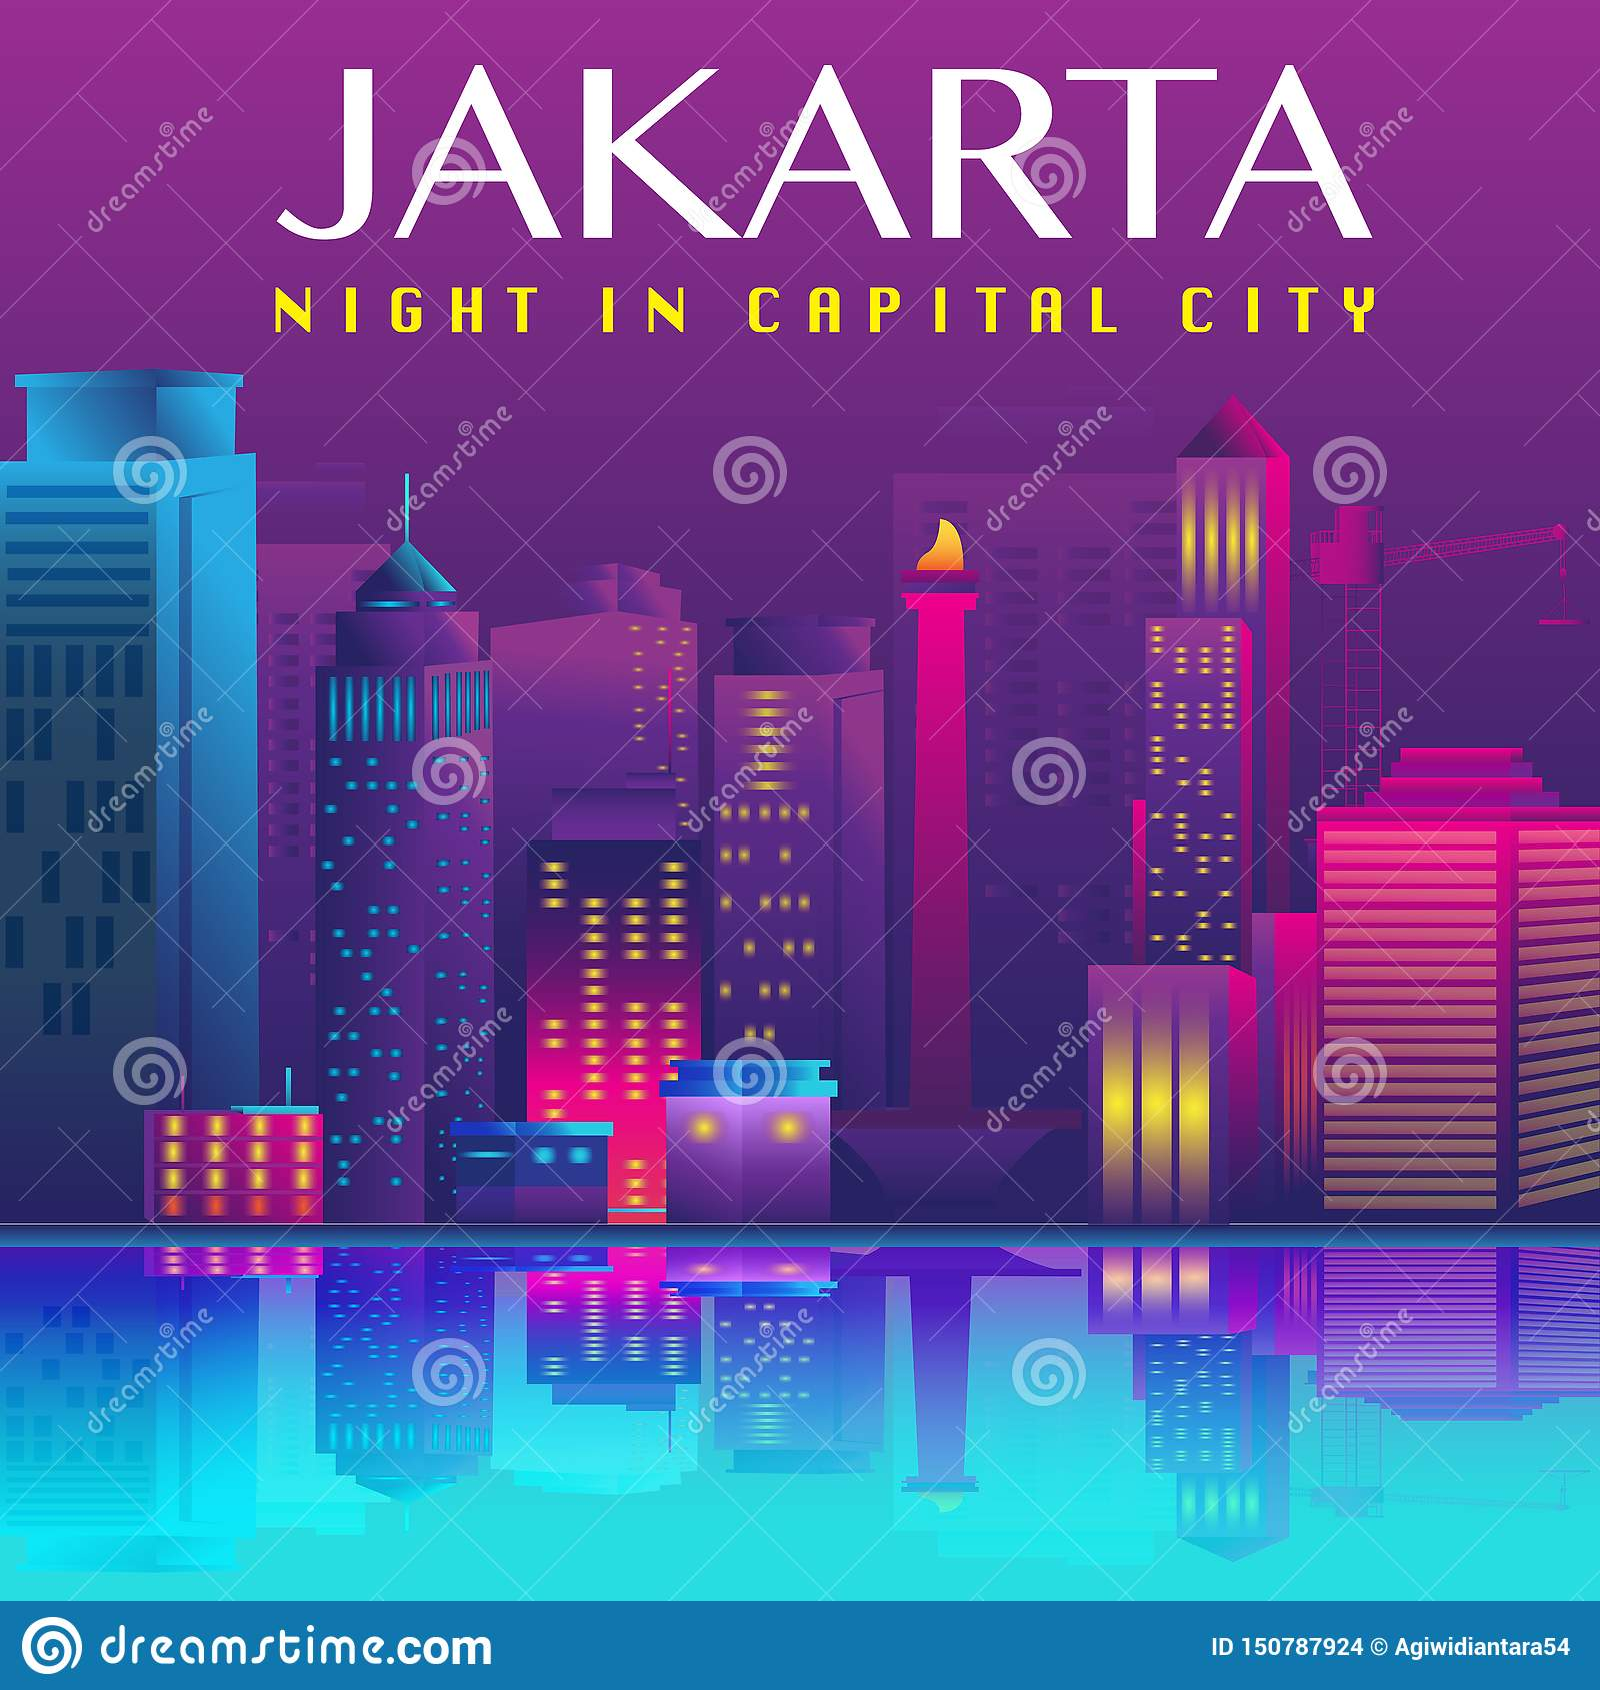 Jakarta Capital City Vector Design